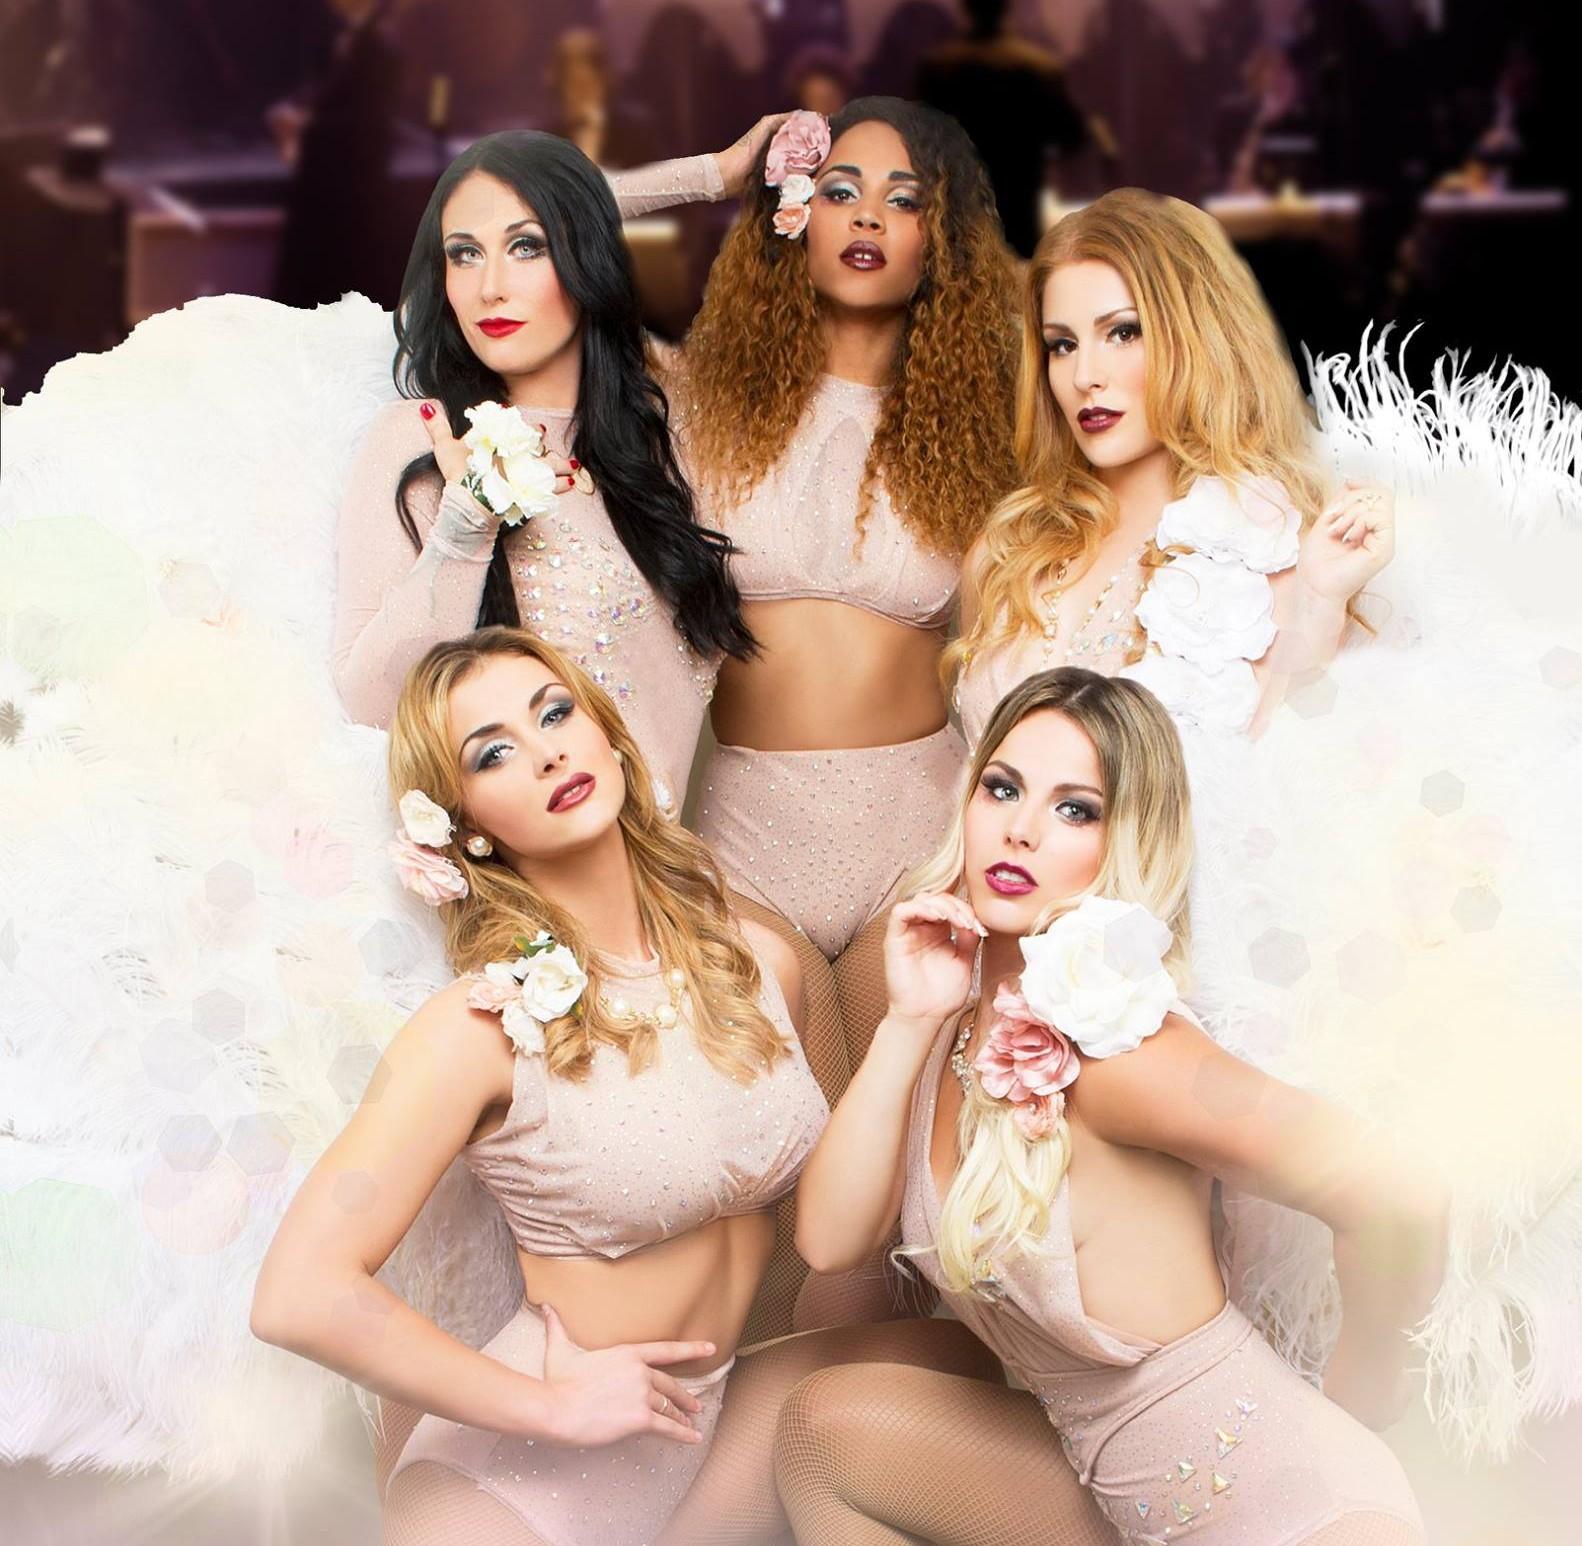 FAM burlesque montreal (4)